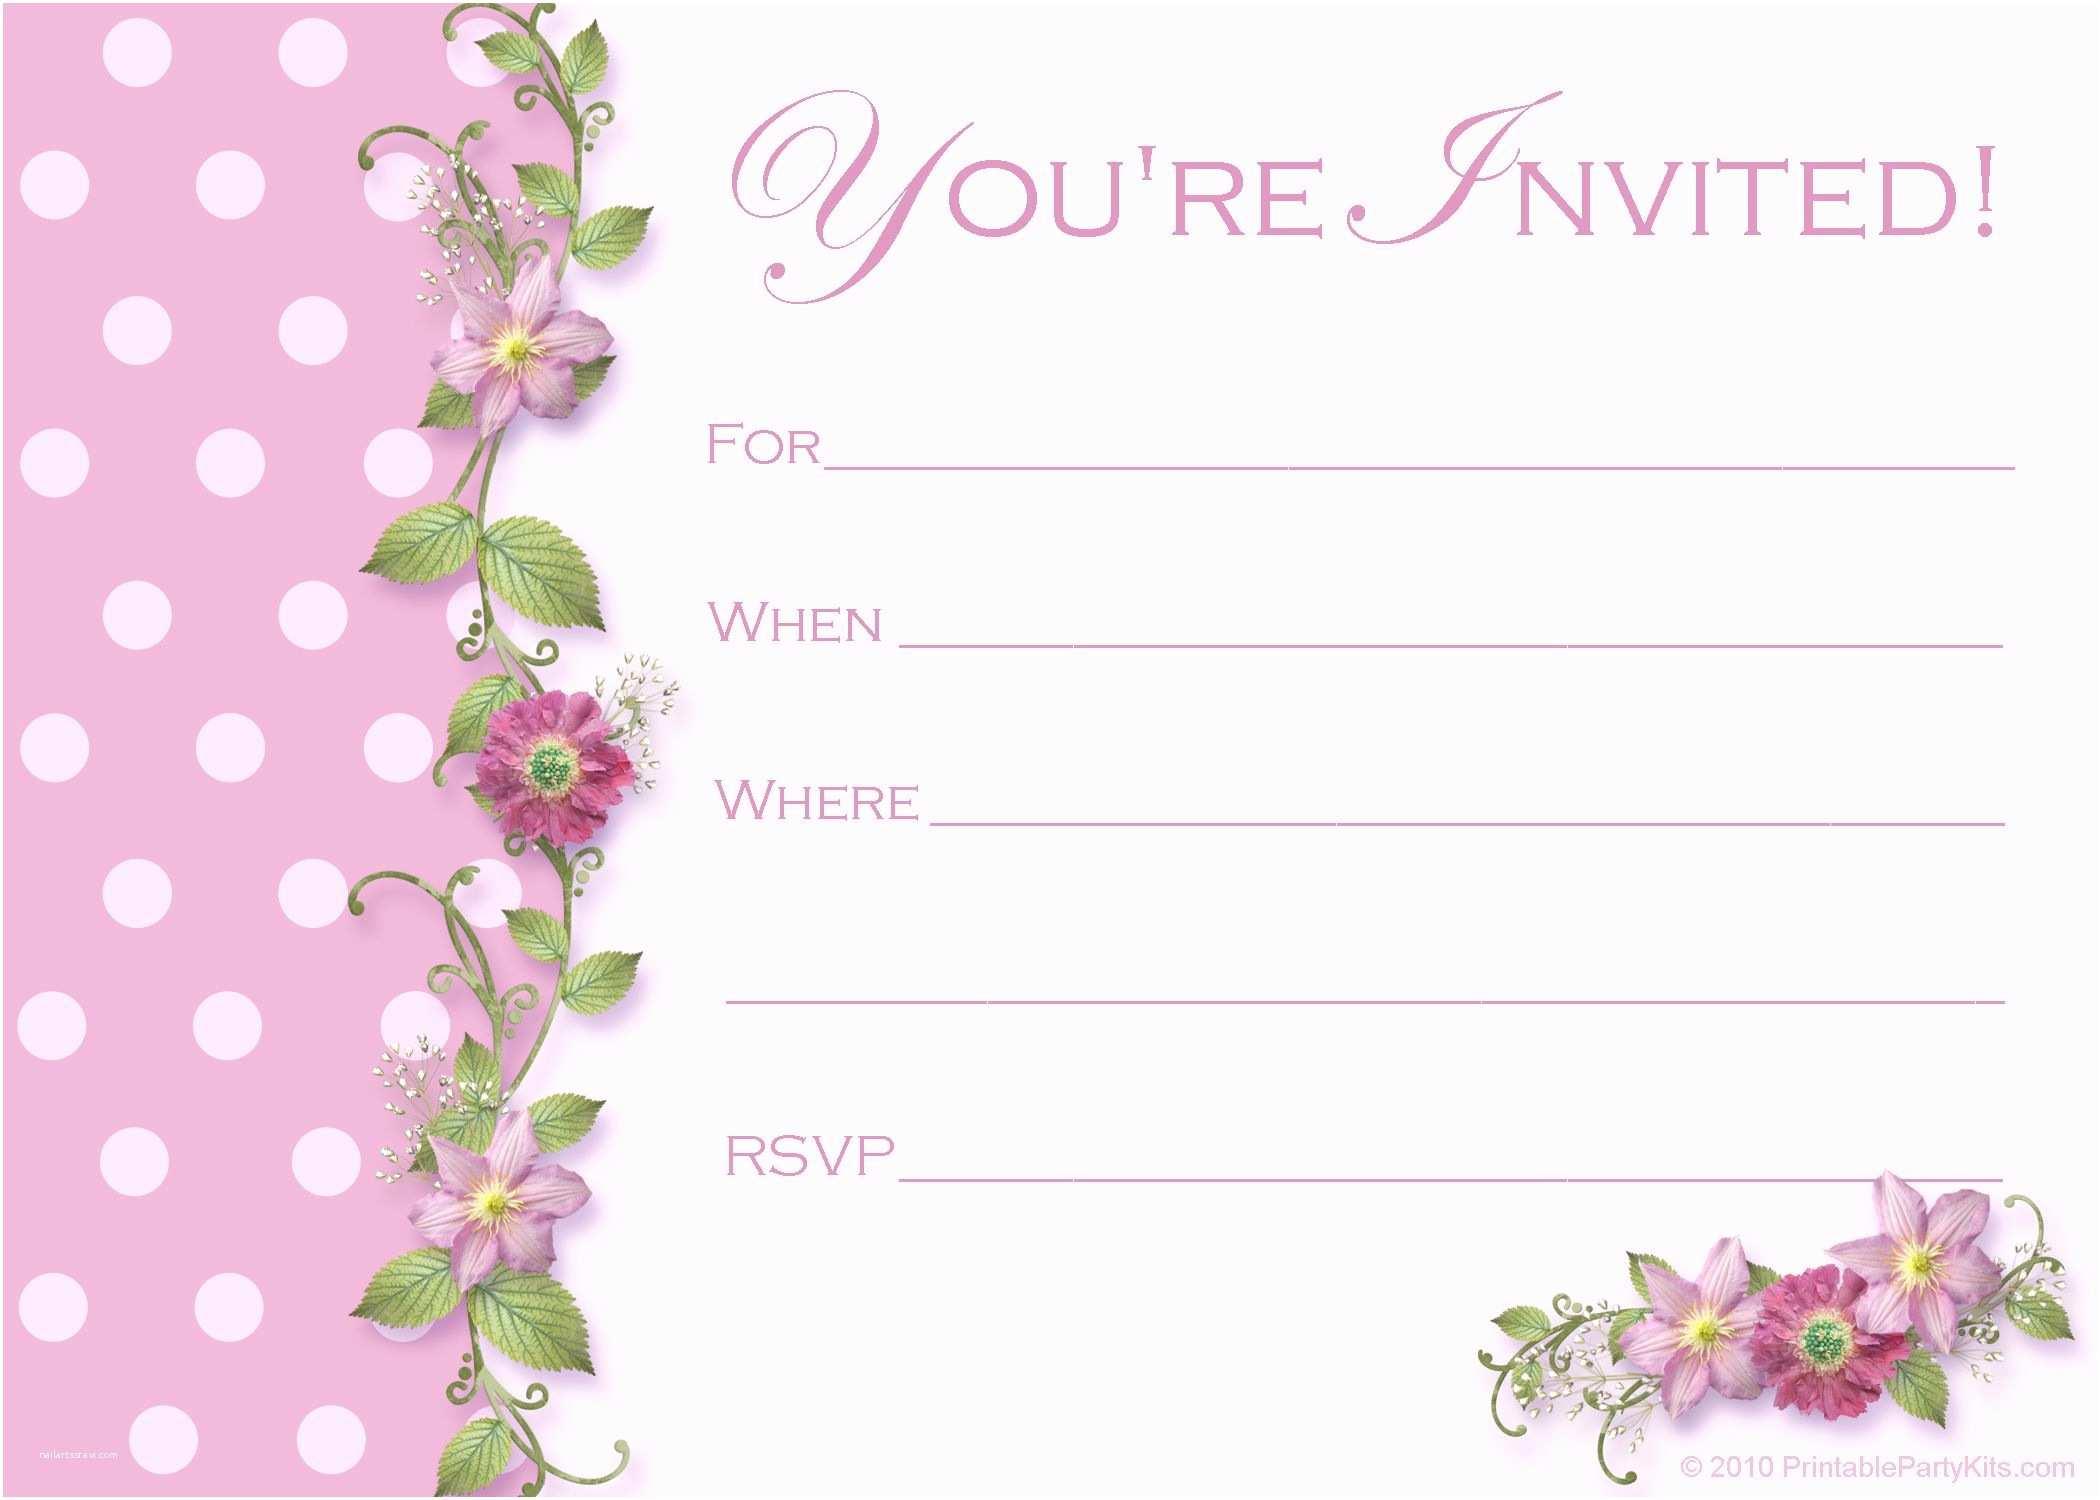 Blank Birthday Invitations Image For